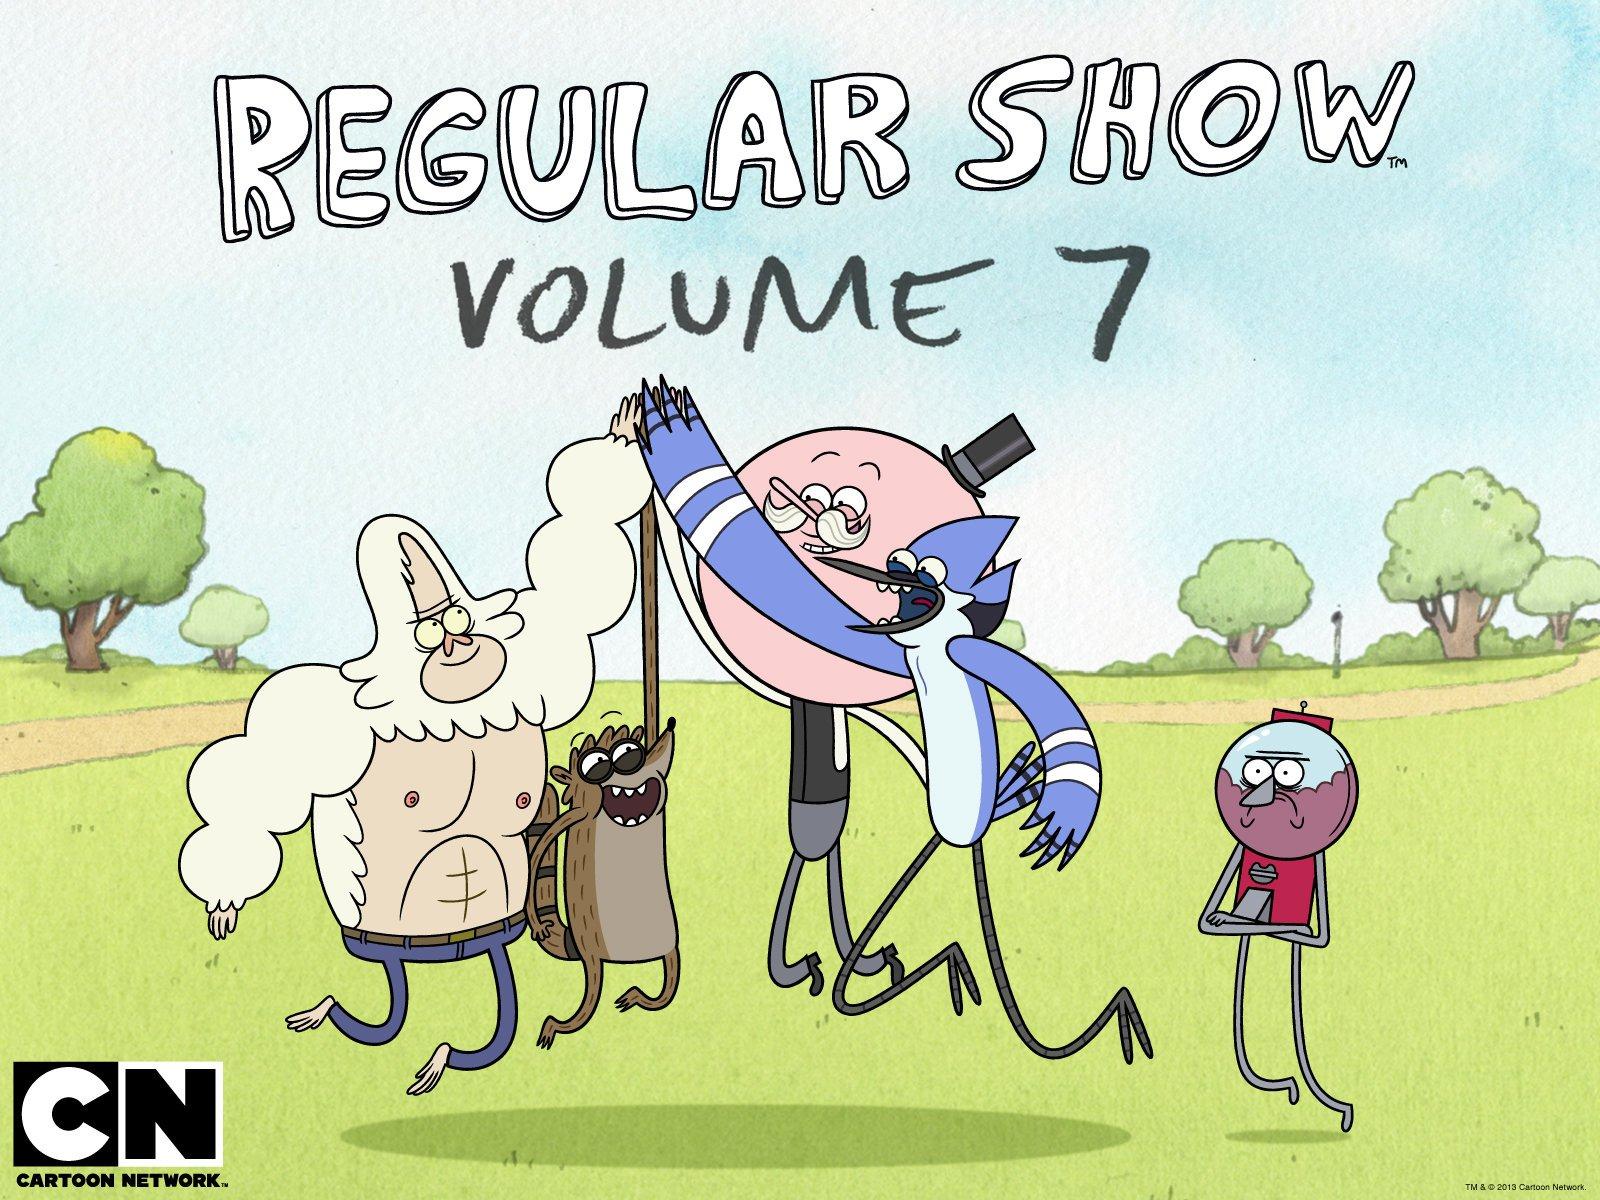 Amazon Regular Show Season 7 Digital Services LLC